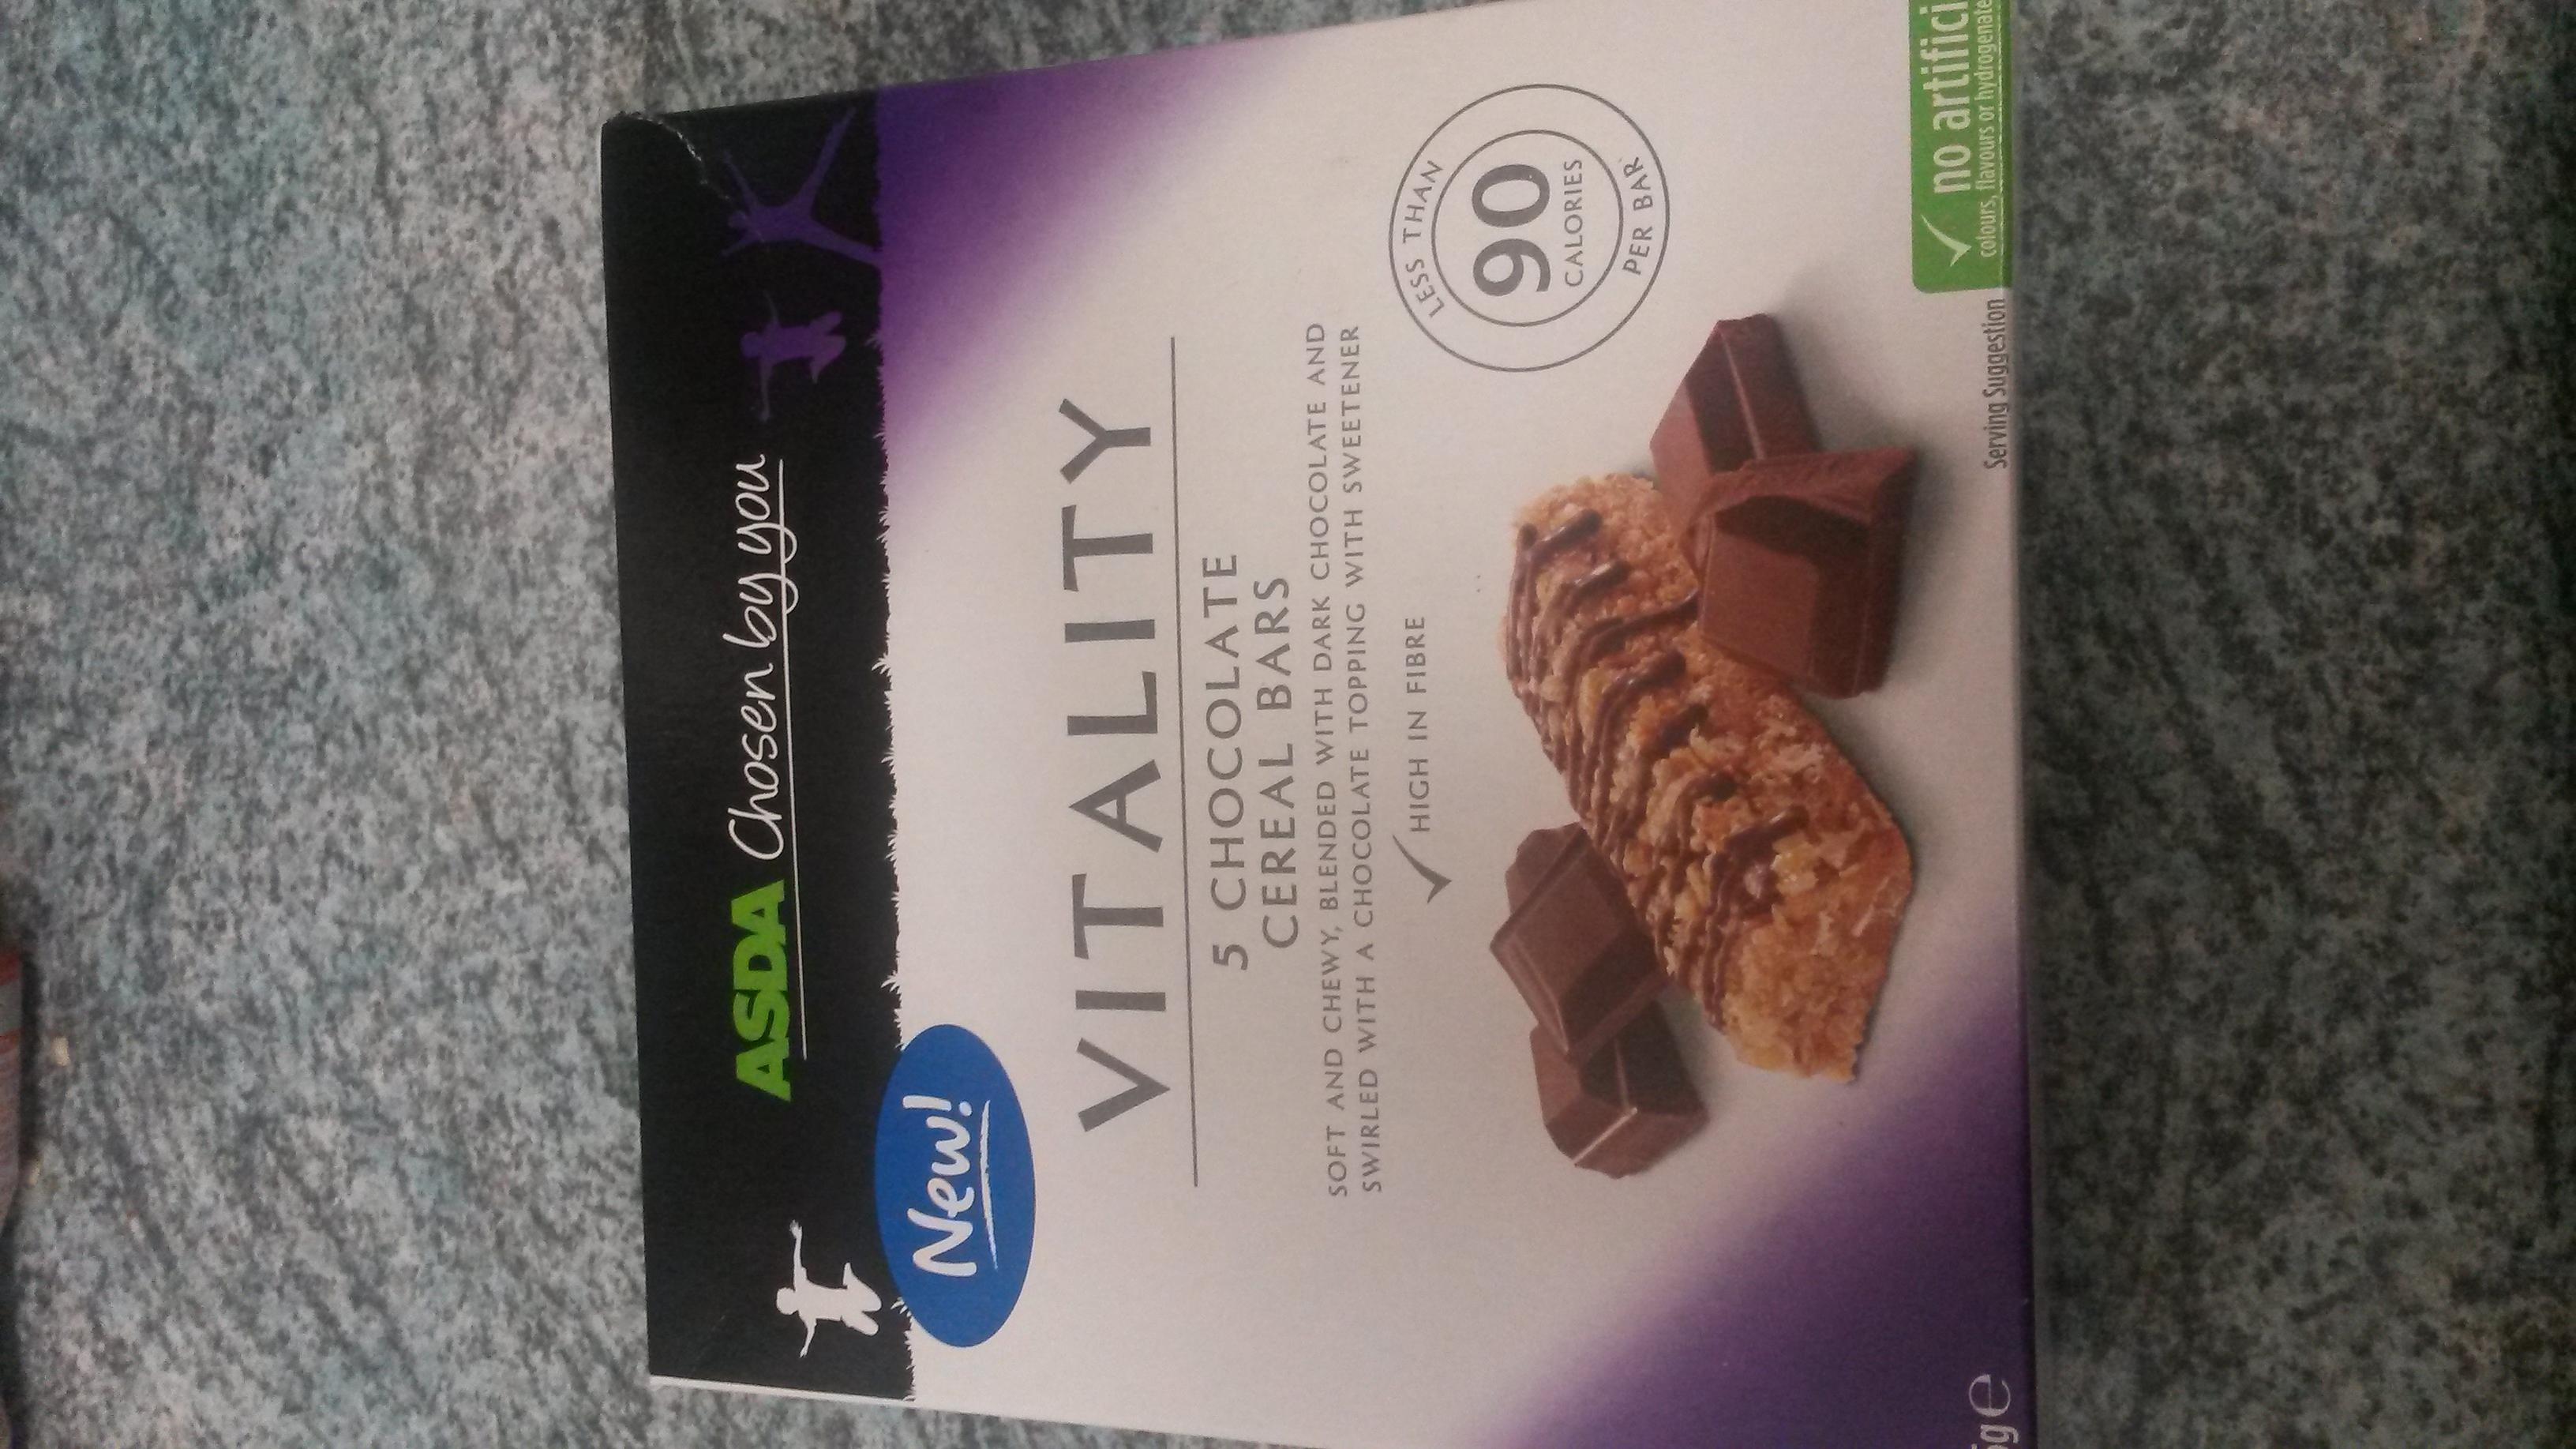 new asda vitality bars-20140331_225915.jpg